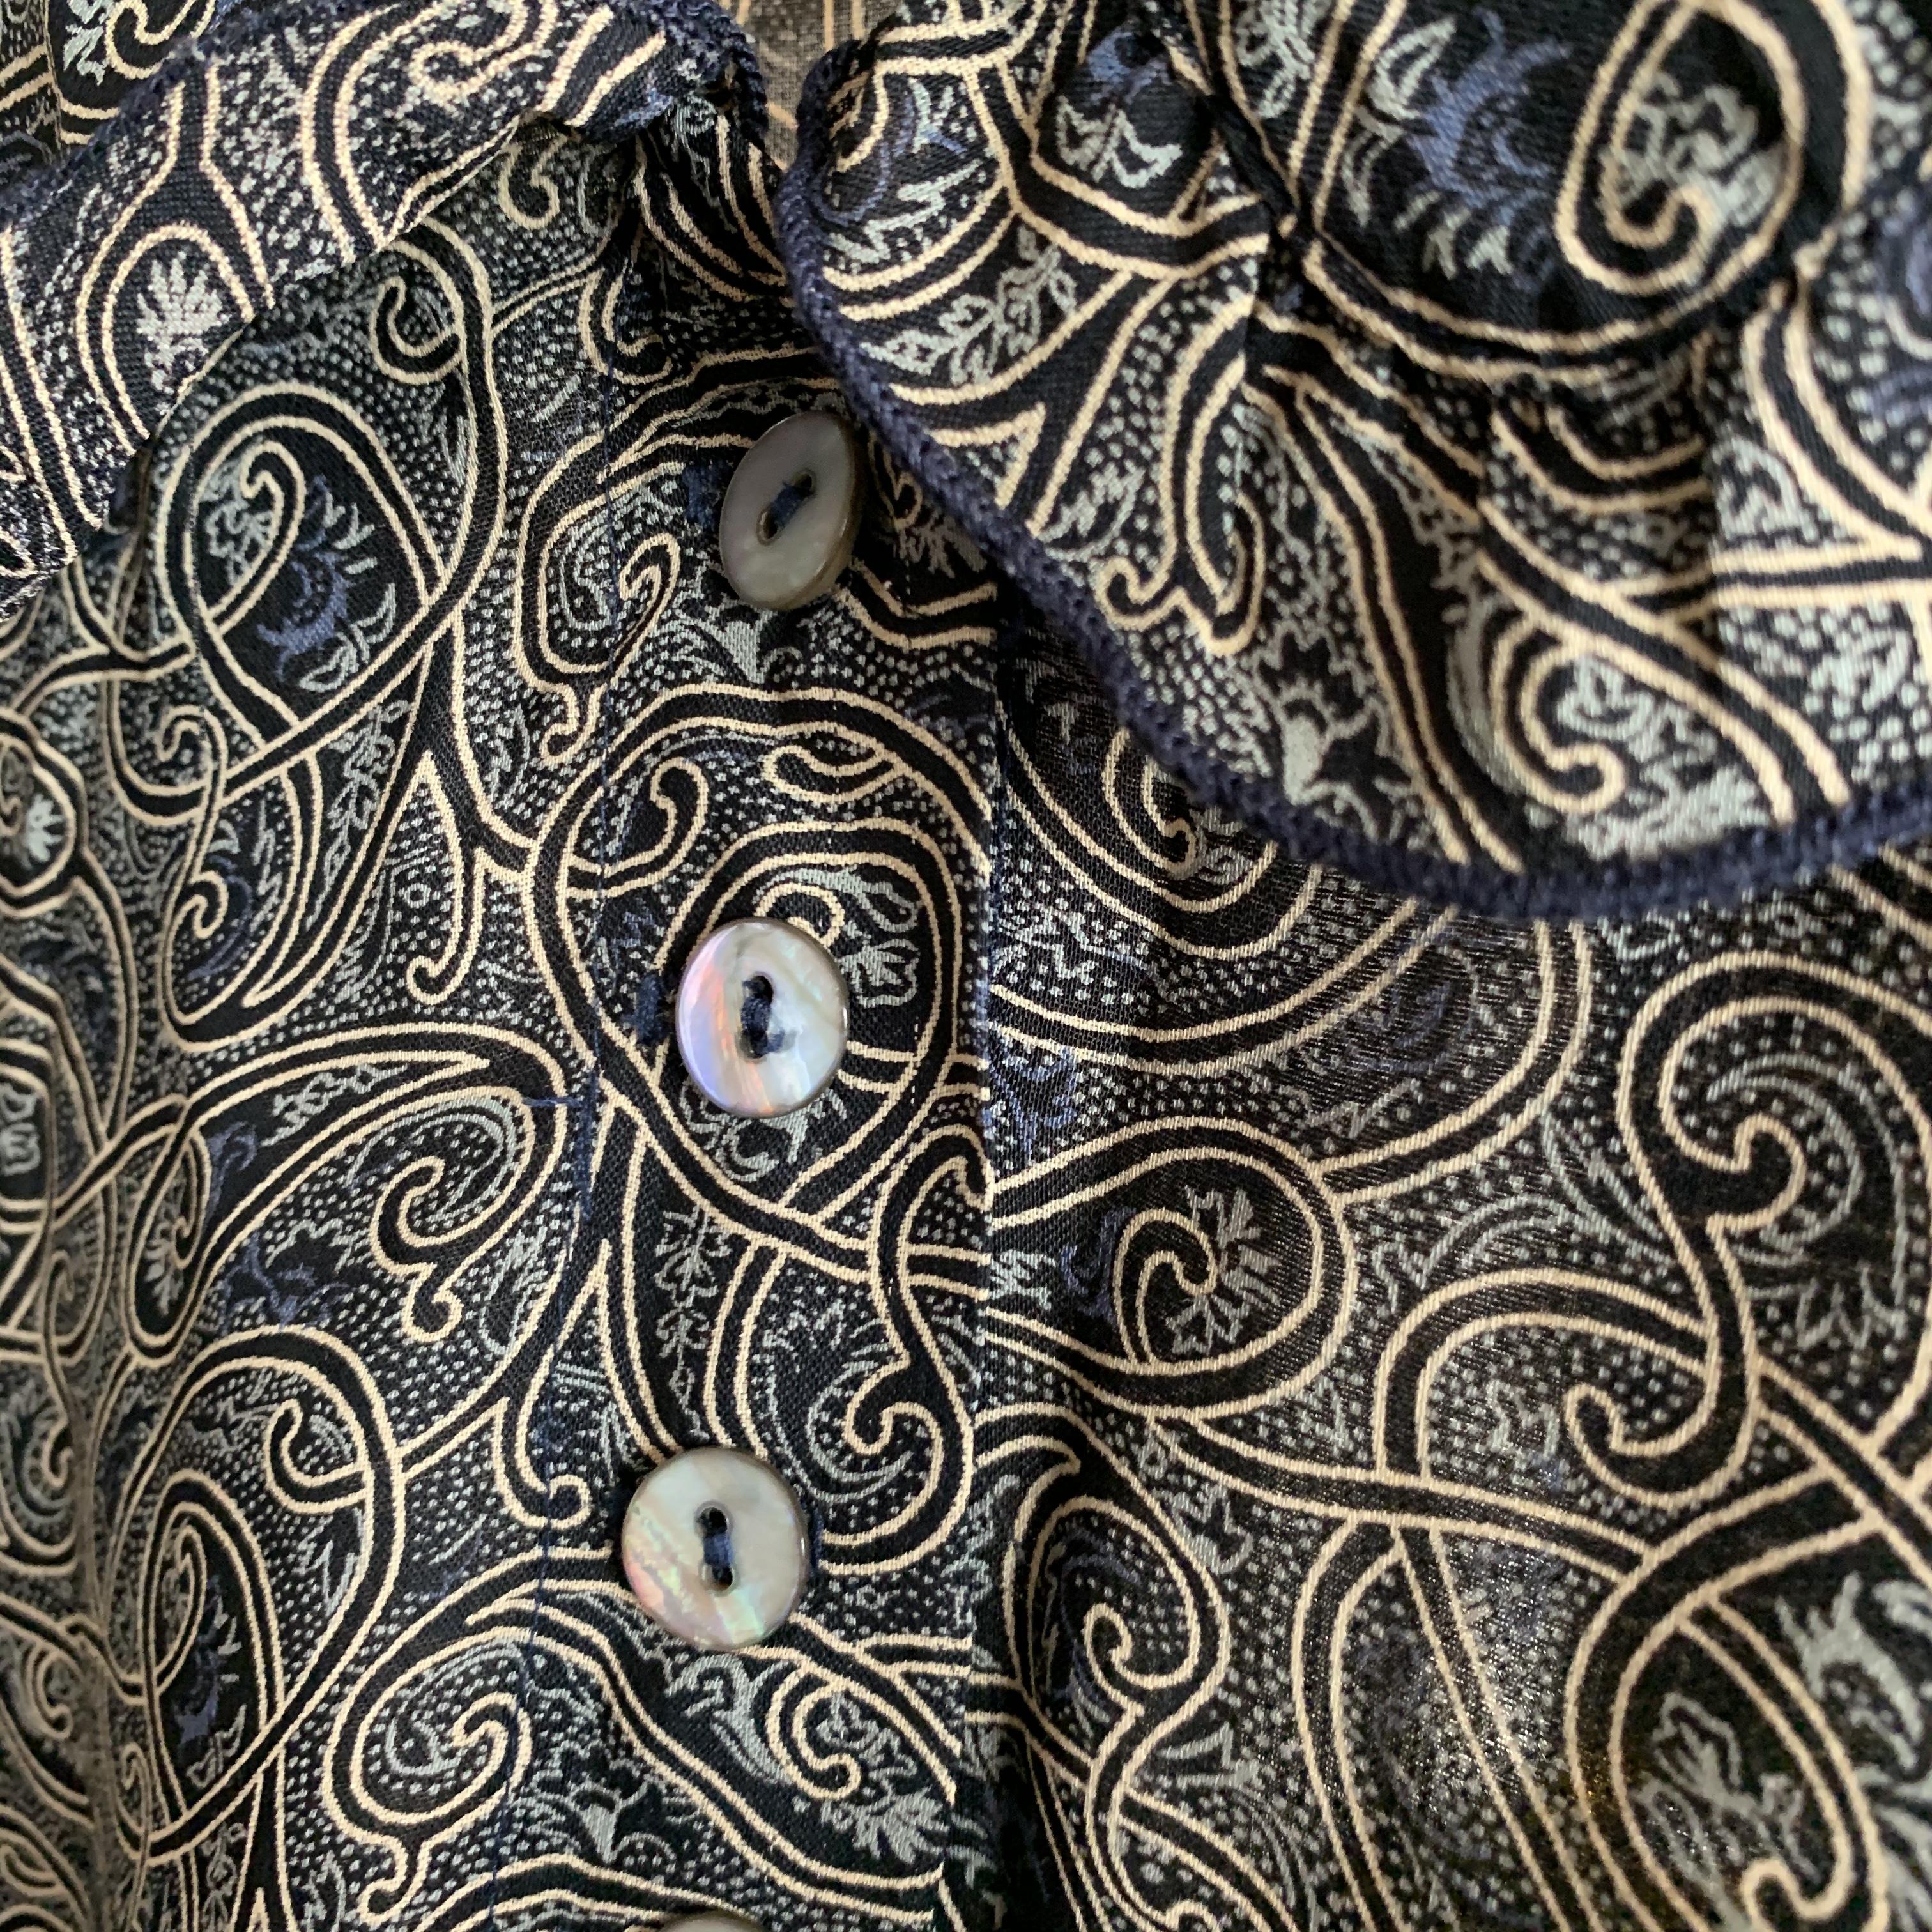 vintage USA shell button design onepiece